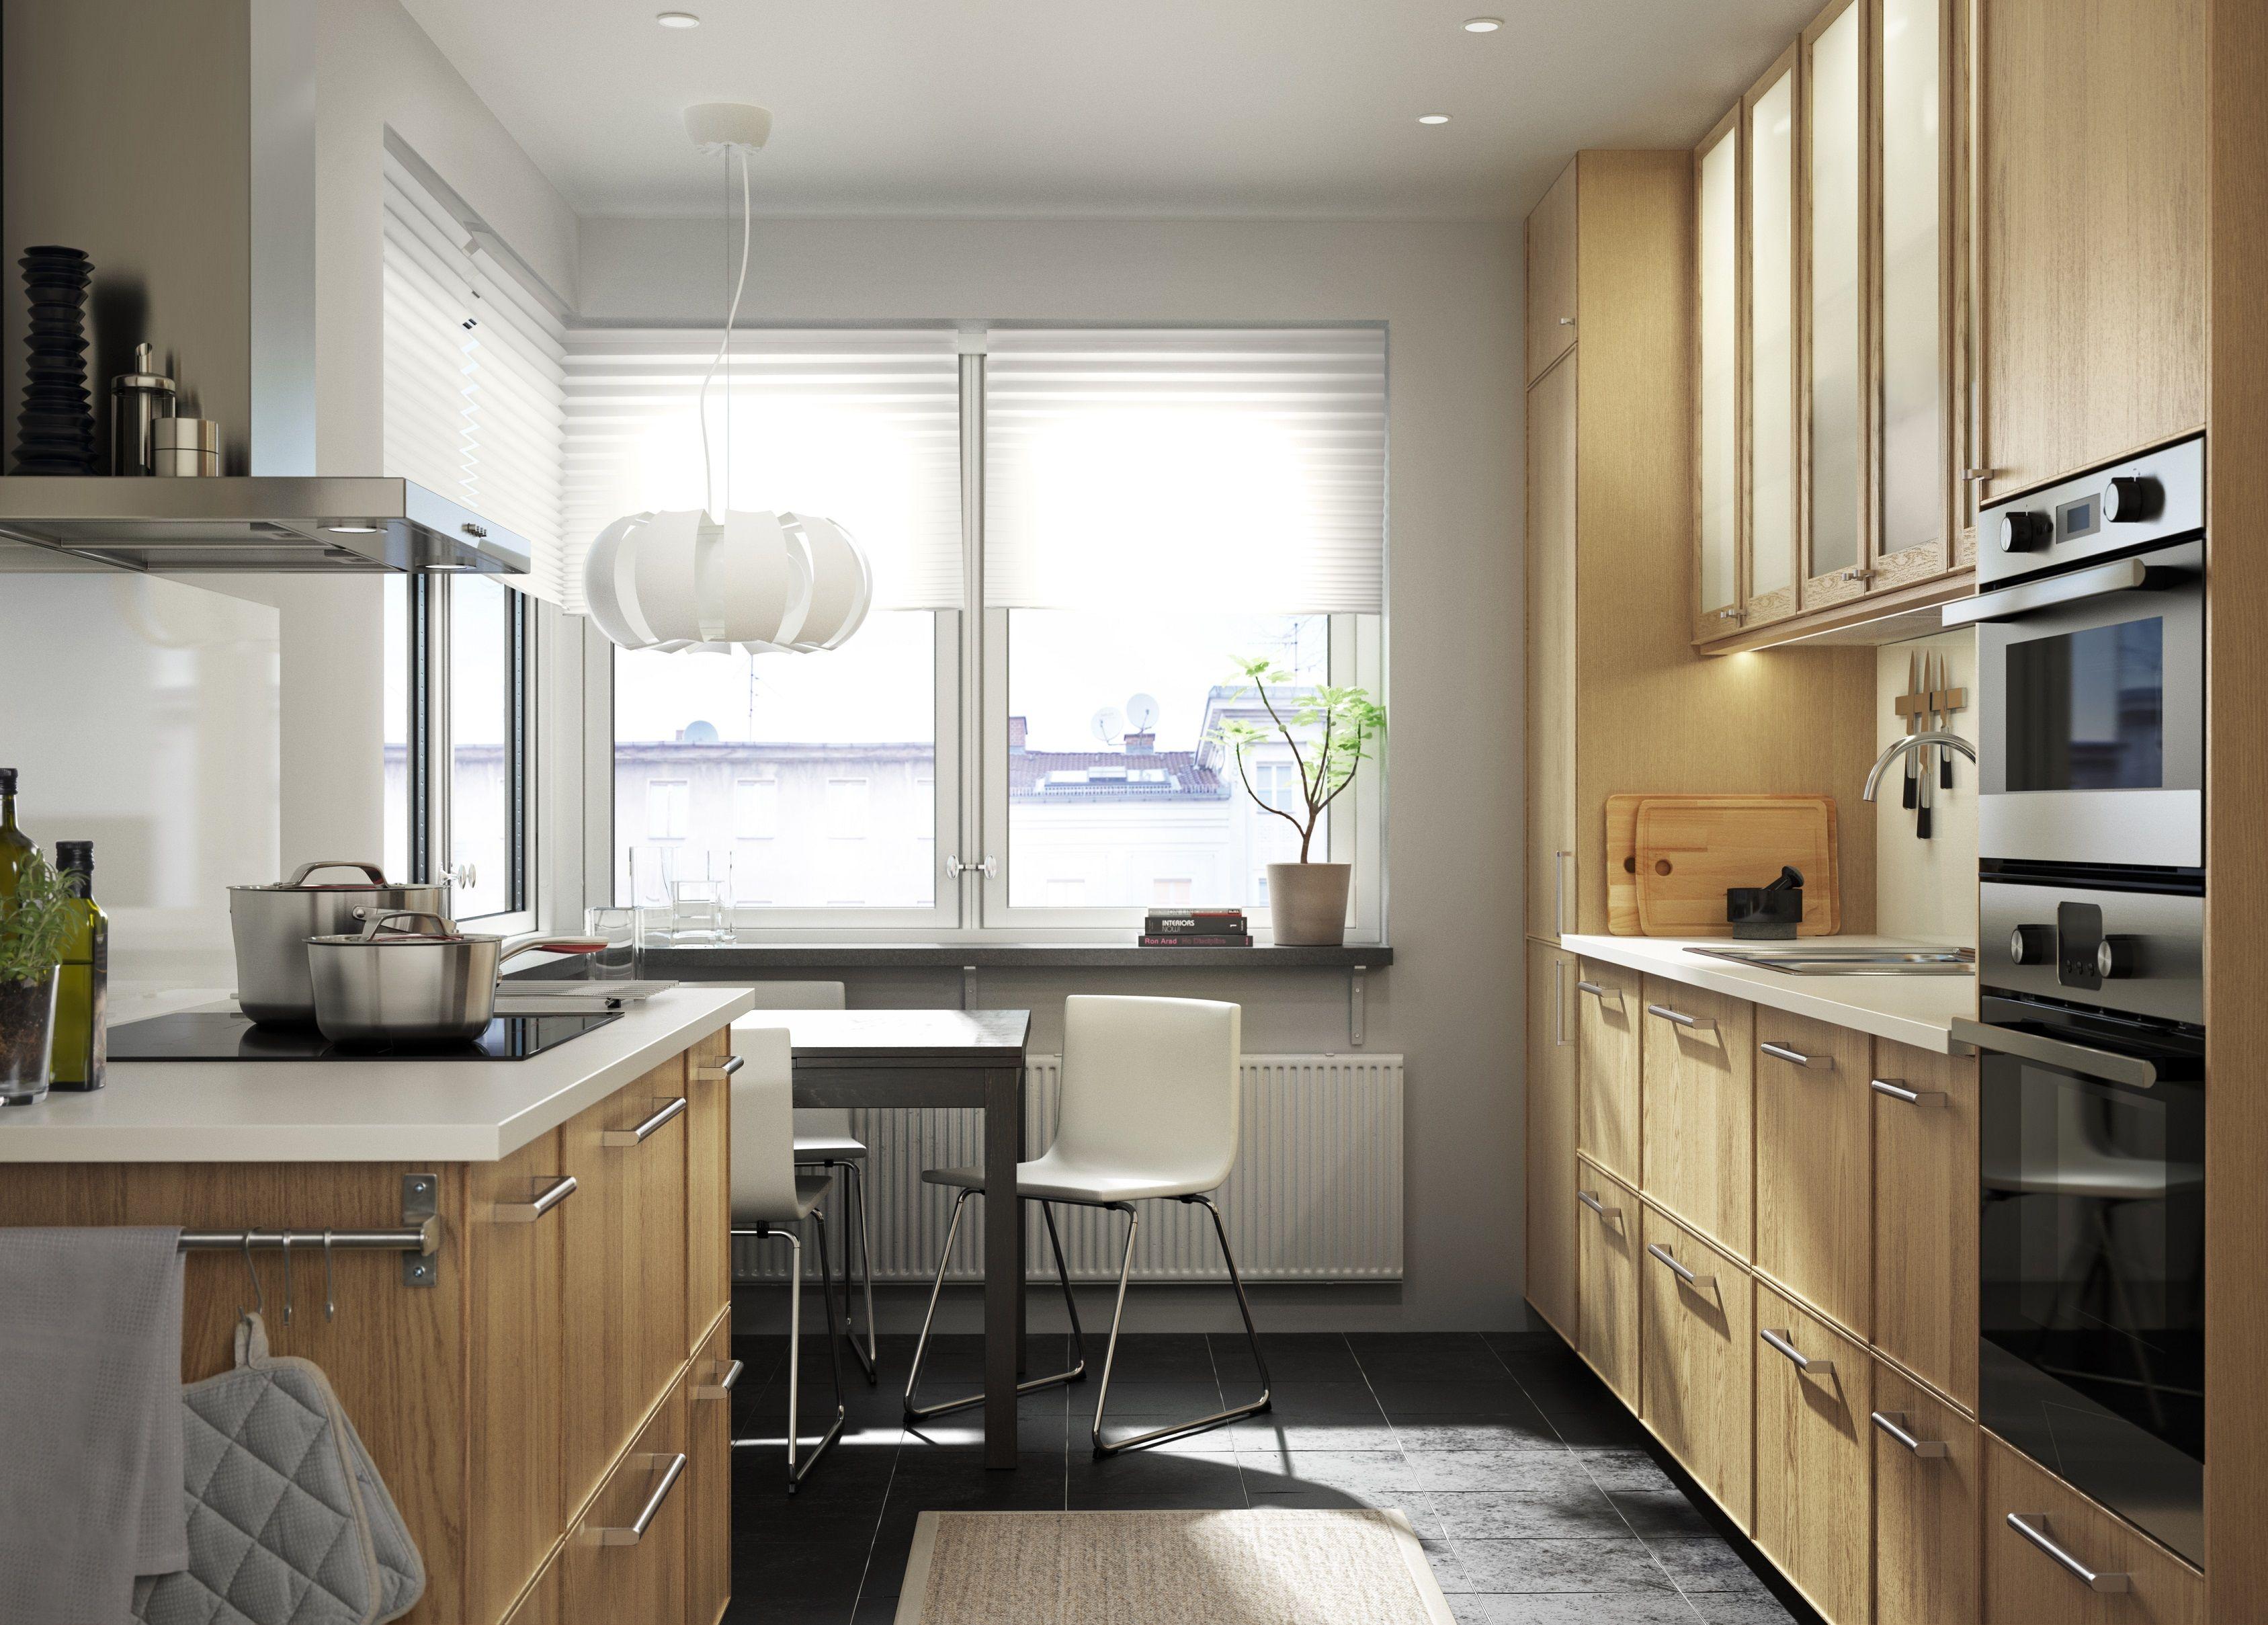 Ikea Ekestad Keuken : Metod keuken #ikea #ikeanl #warm #hout #keukensysteem #ekestad